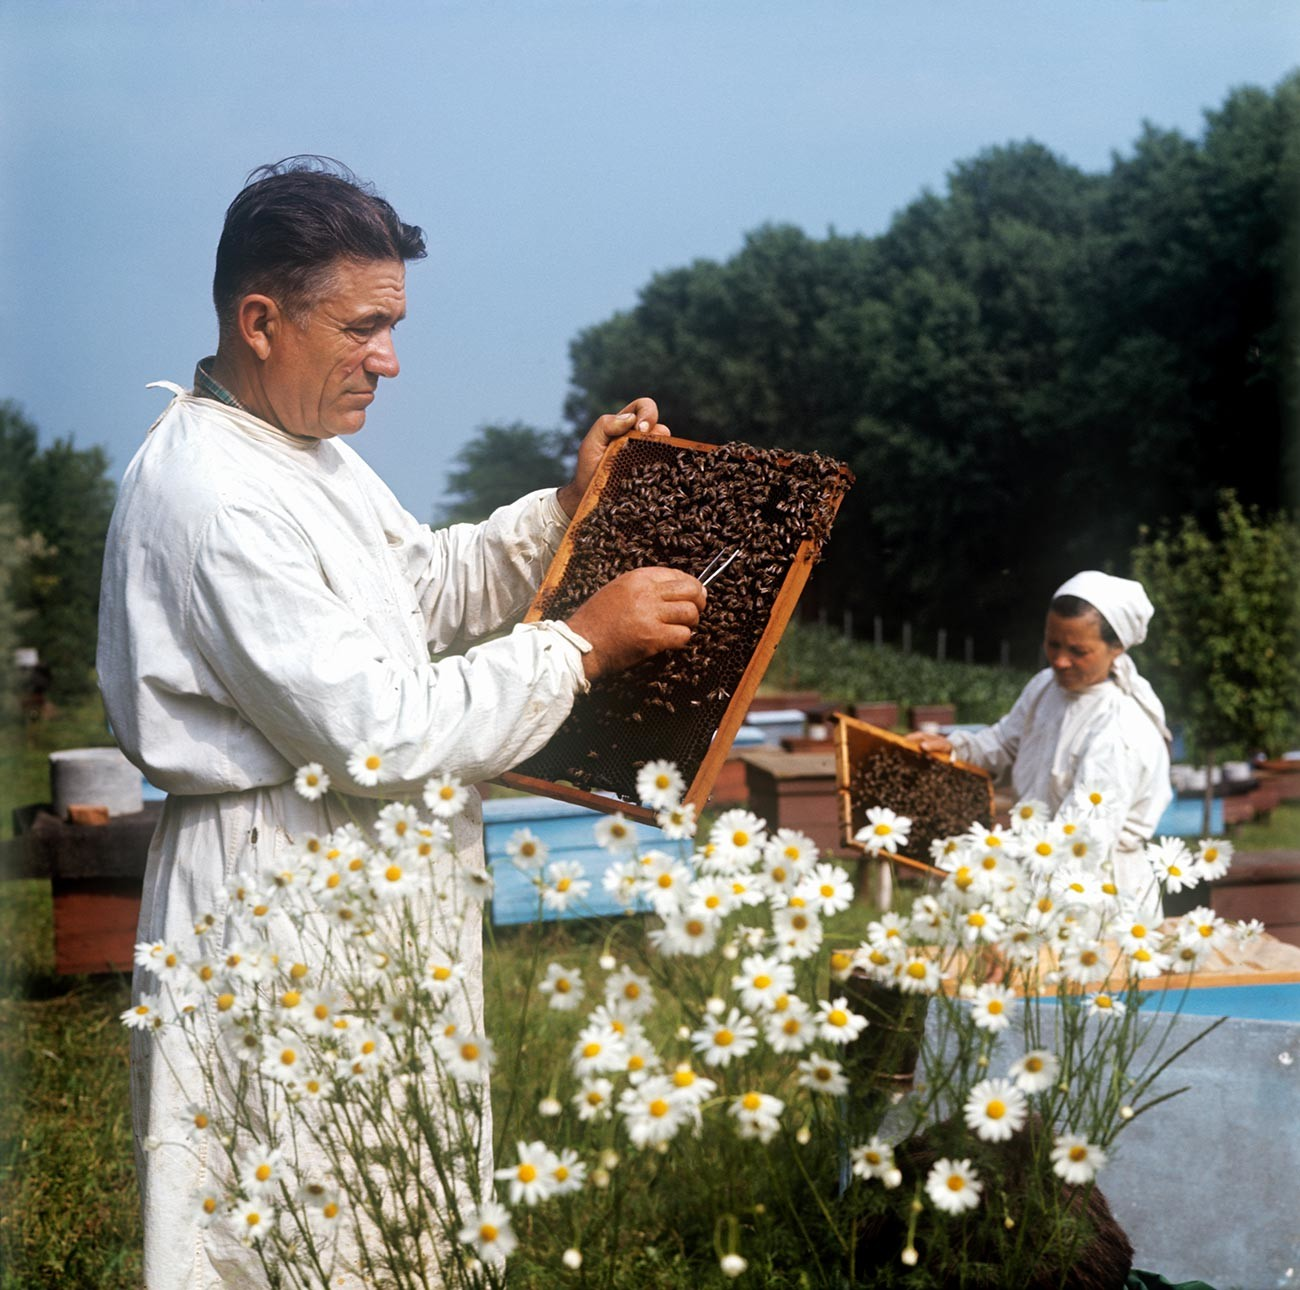 Пчеловода Антон Лупулчук в колхоза